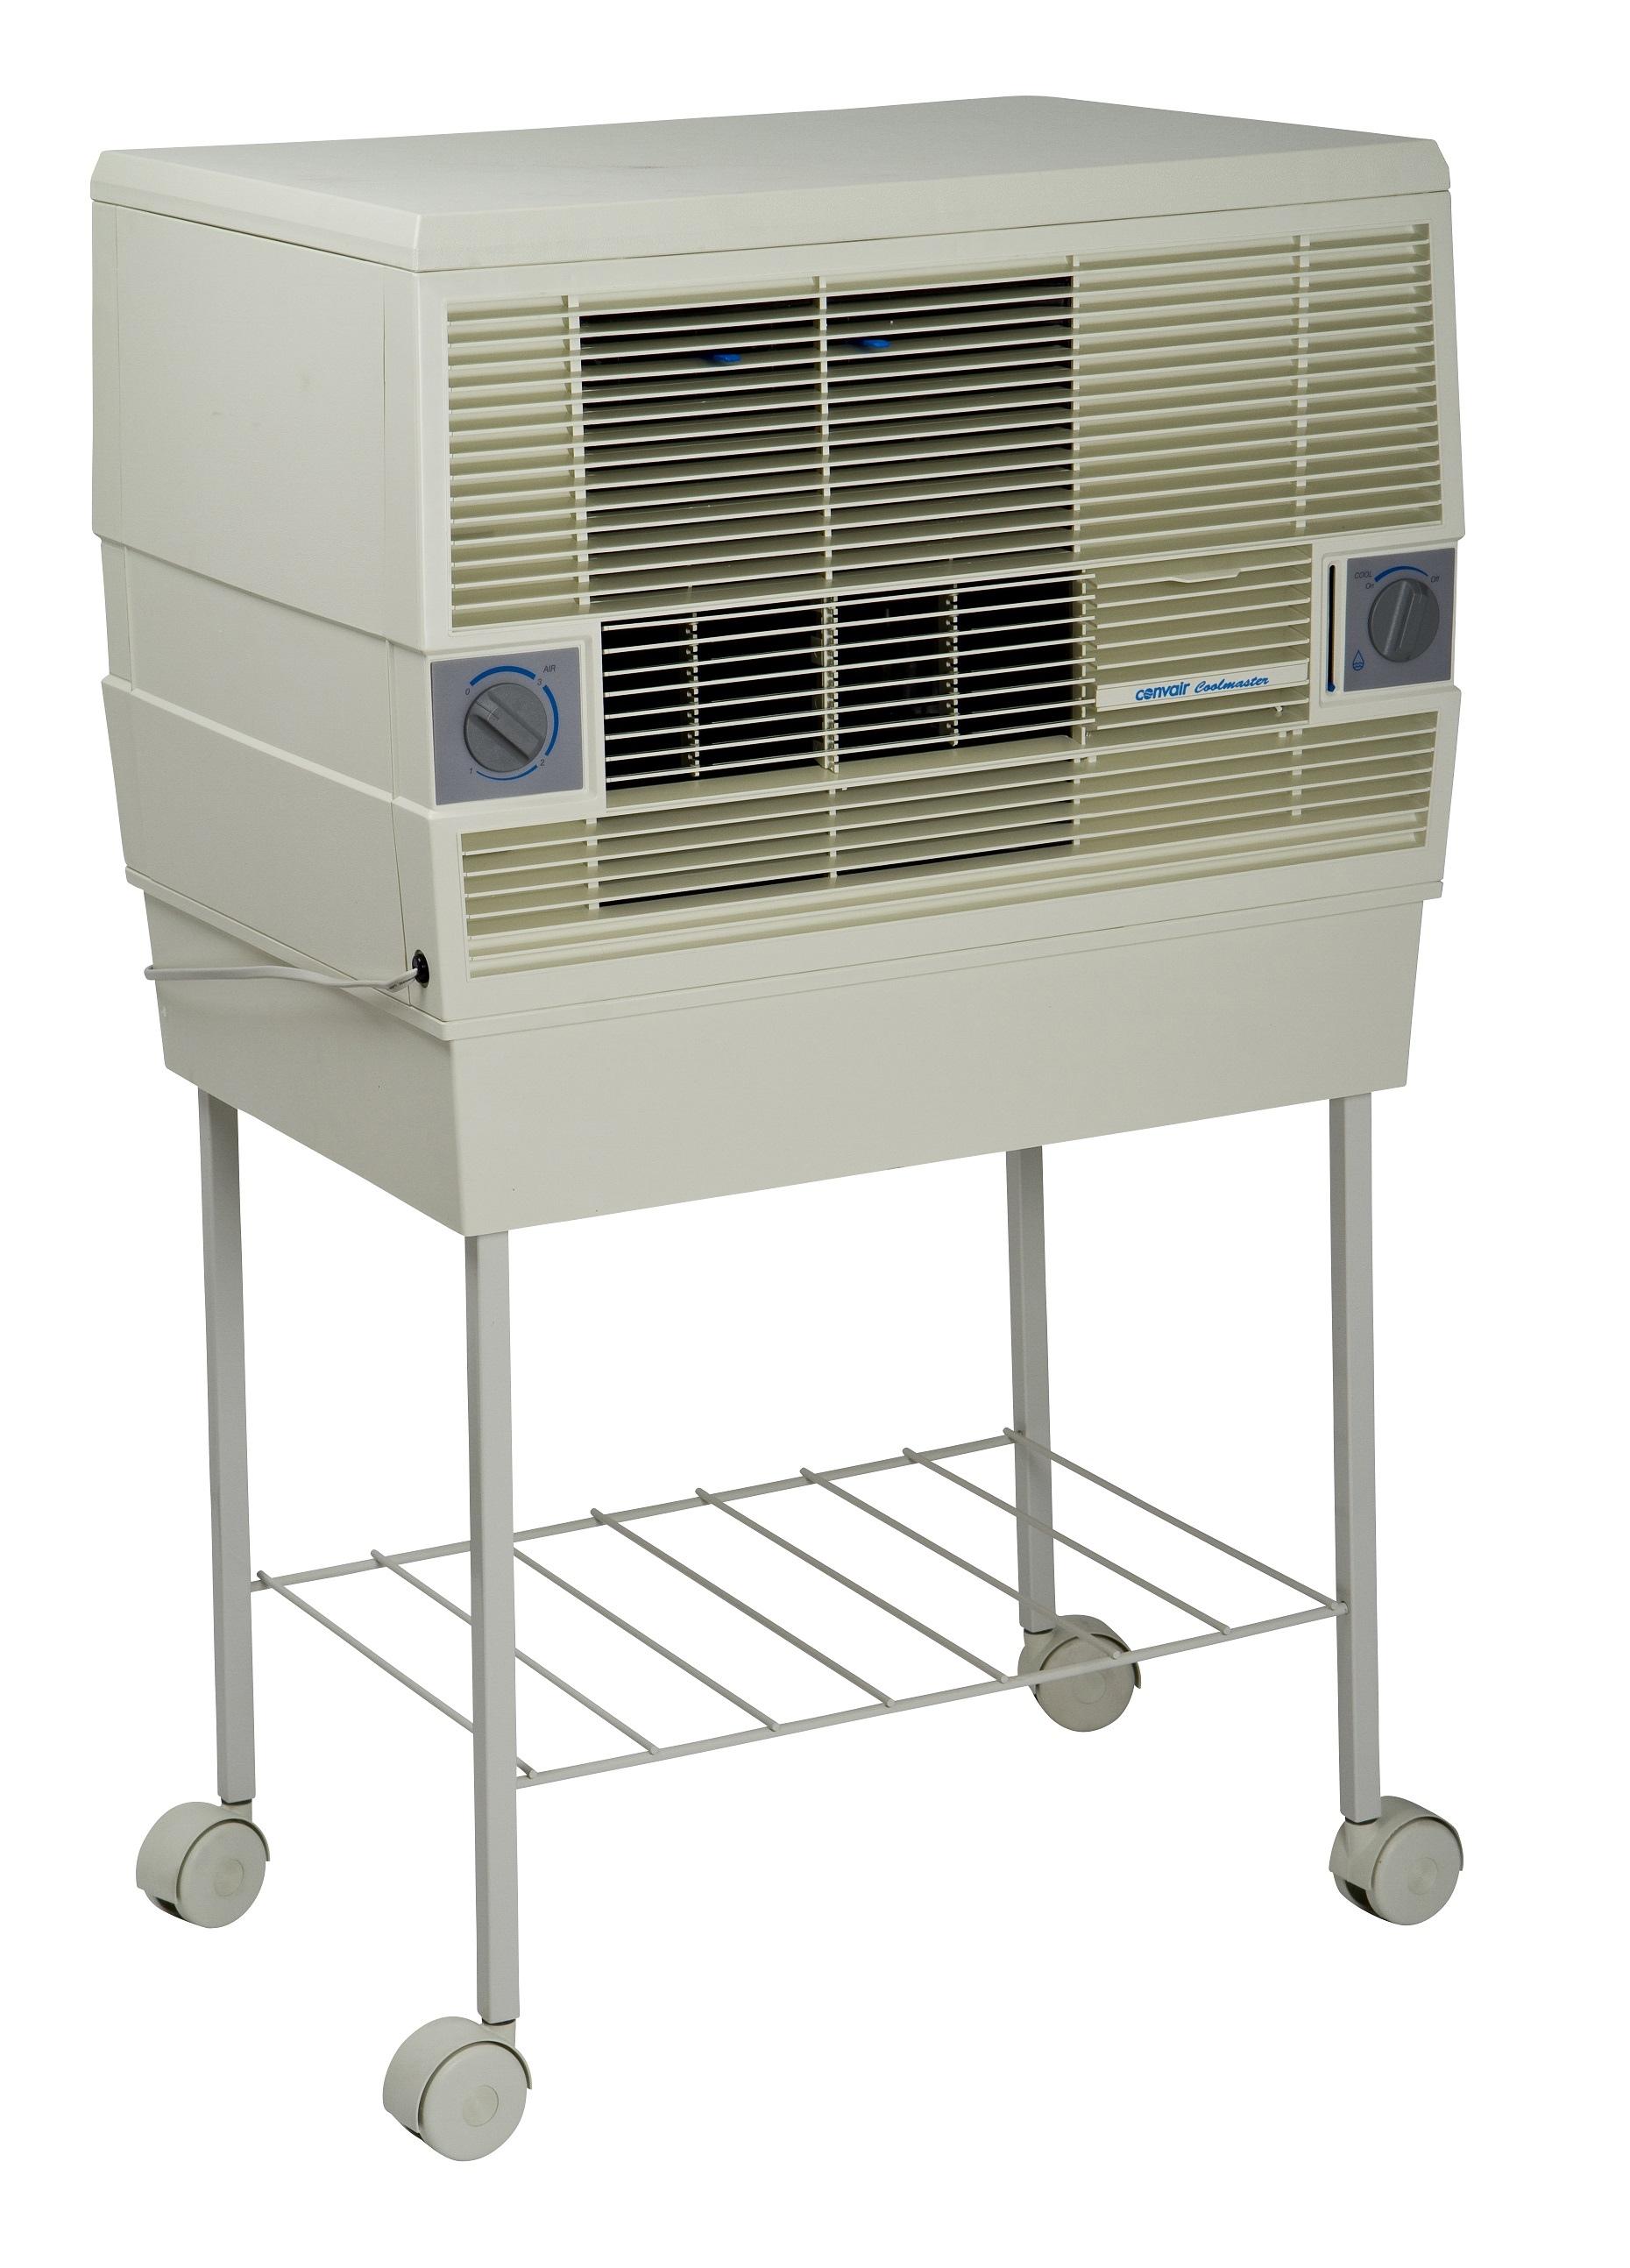 convair 3000 portable air cooler evaporative humidifier ebay. Black Bedroom Furniture Sets. Home Design Ideas